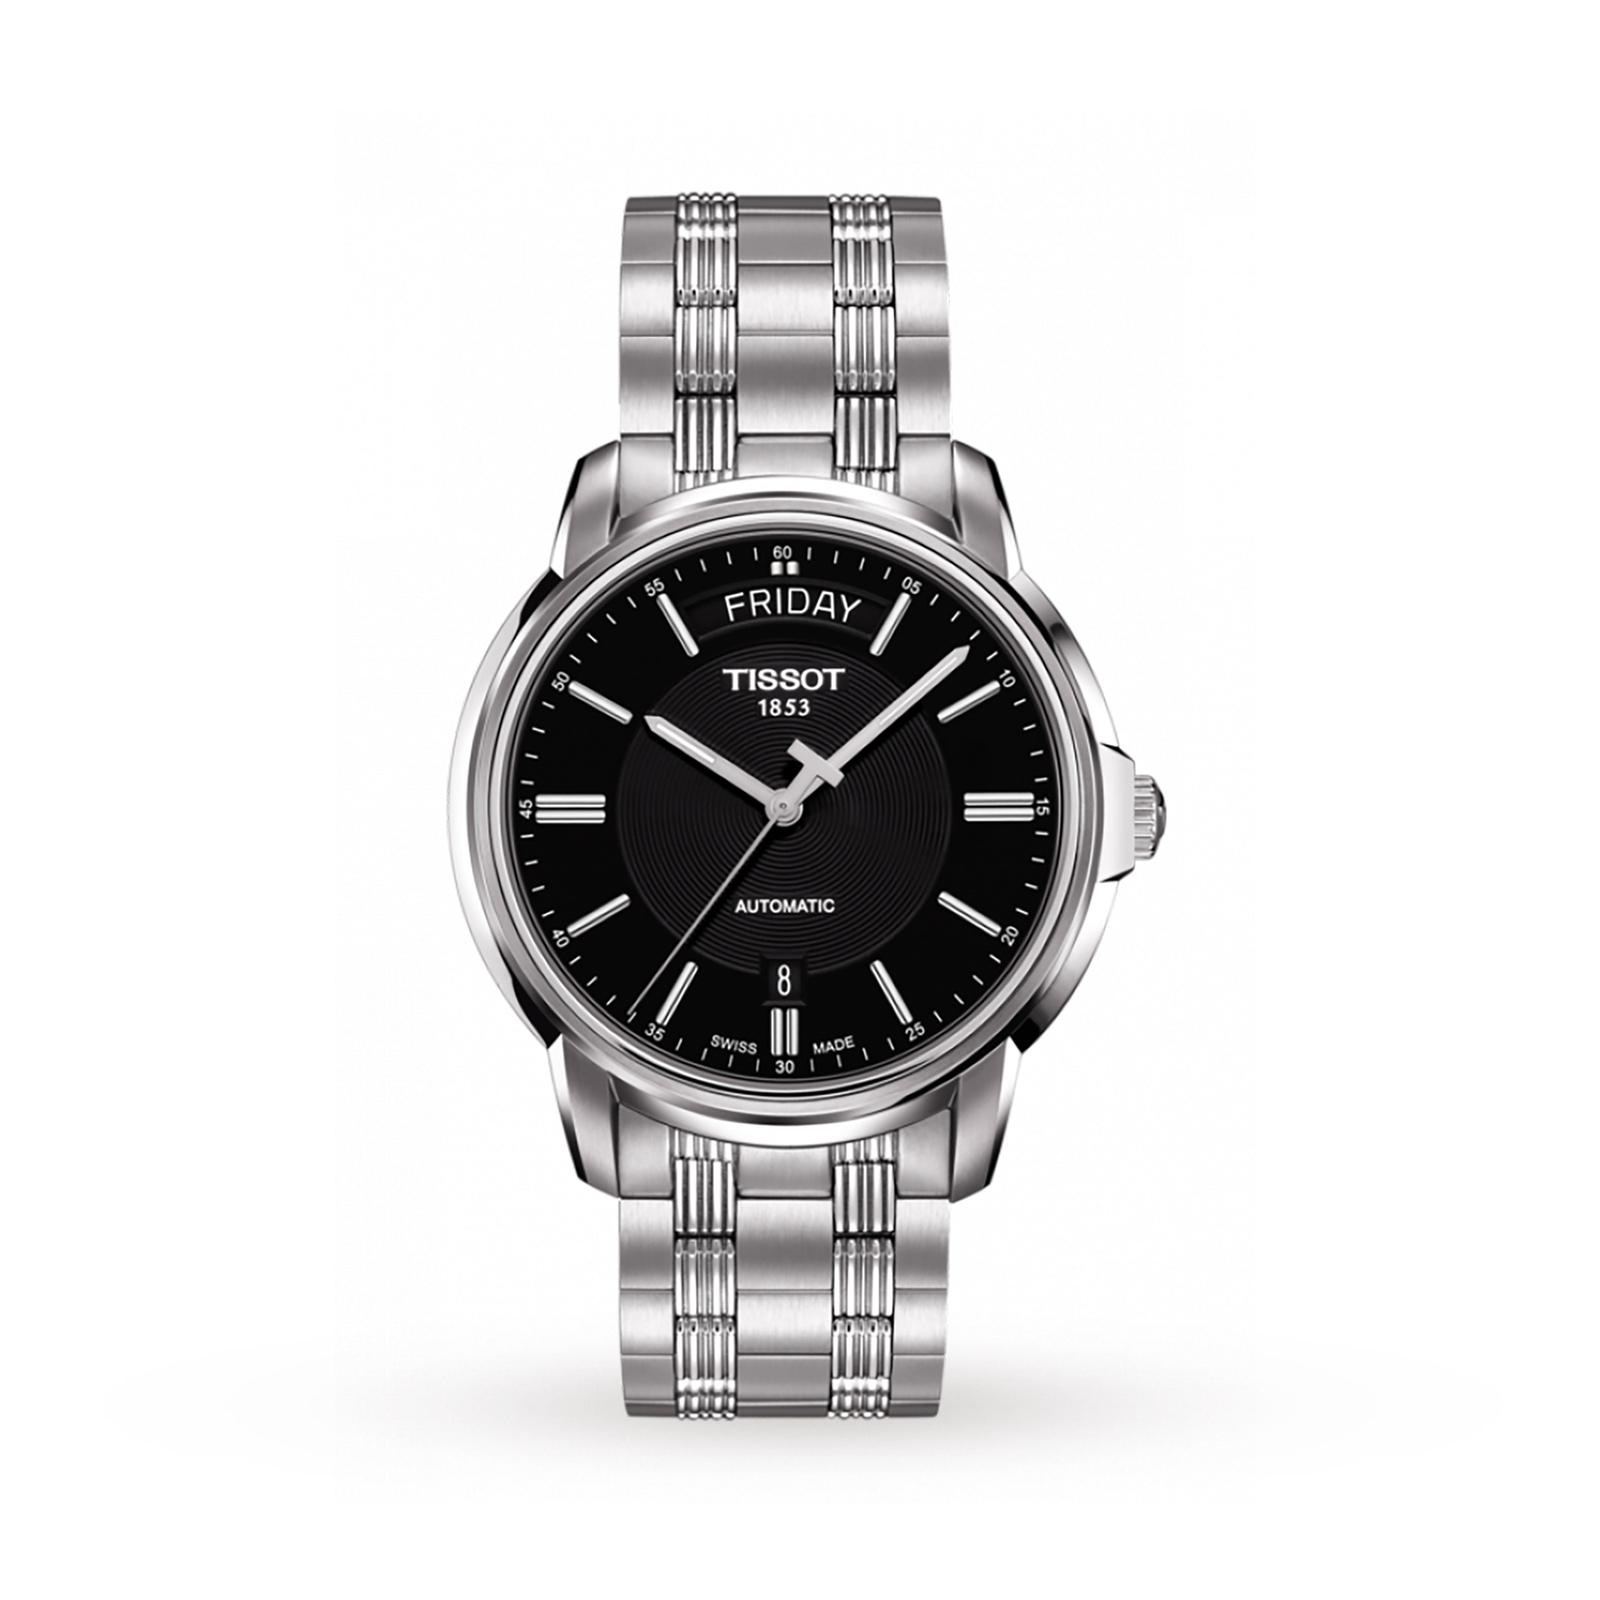 TISSOT Automatics III Day Date Sapphire Crystal And ETA Movement Watch £261 @ Goldsmiths